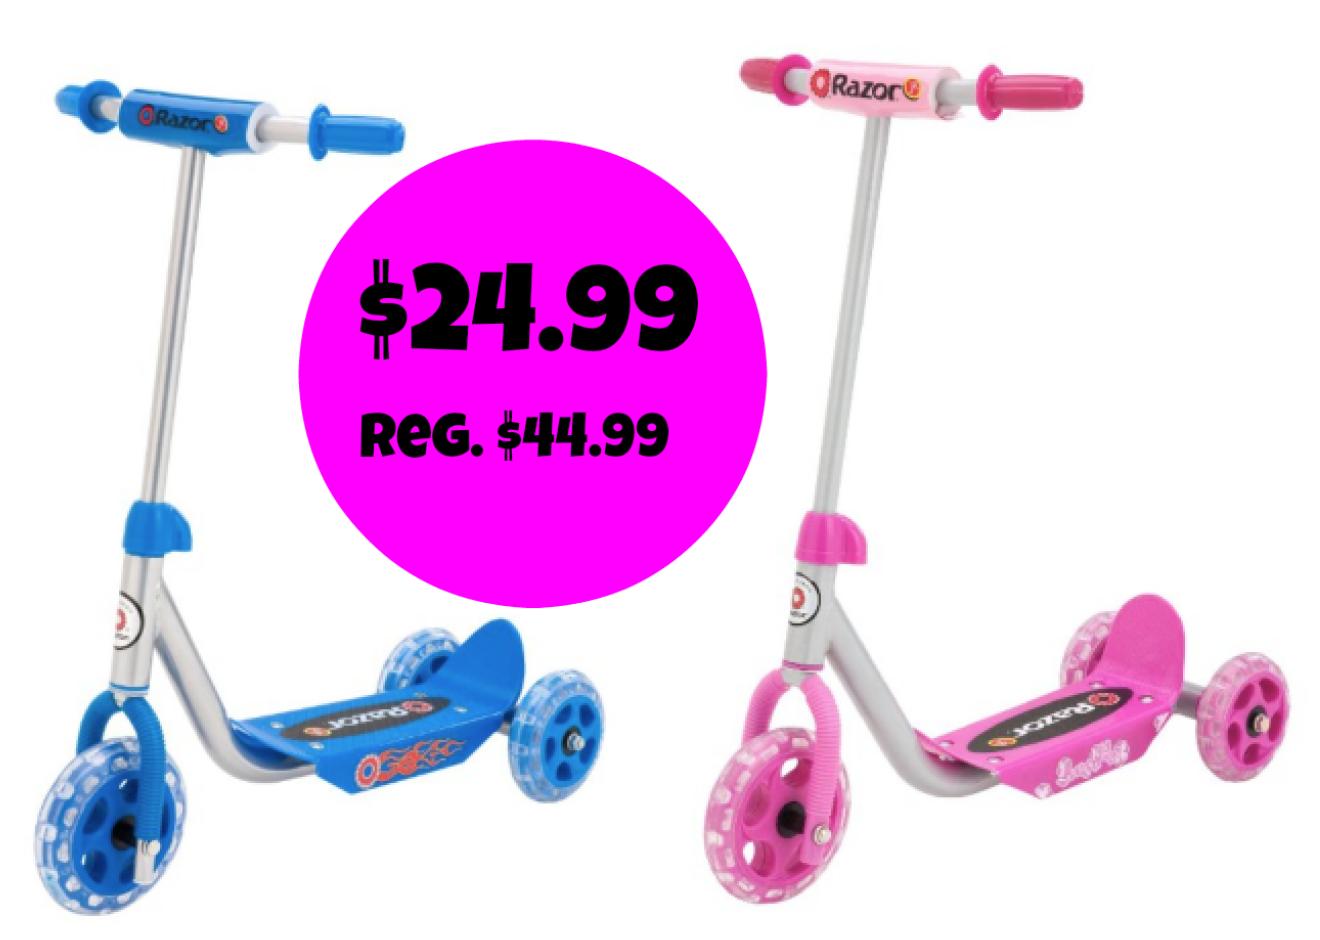 http://www.thebinderladies.com/2014/10/amazon-razor-jr-kiddie-kick-scooters.html#.VExF777dtbw